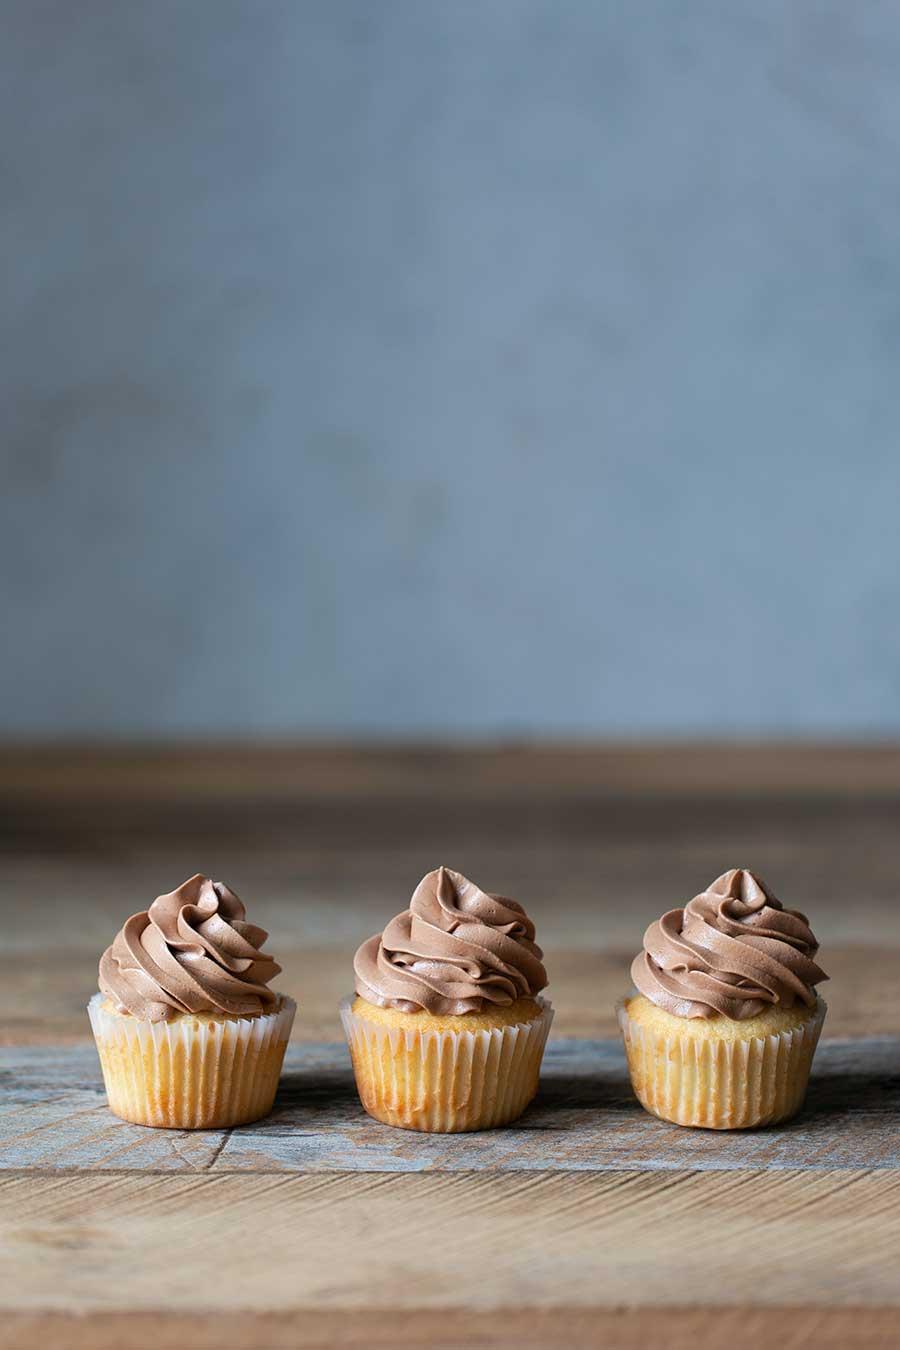 Three vanilla cupcakes with chocolate buttercream